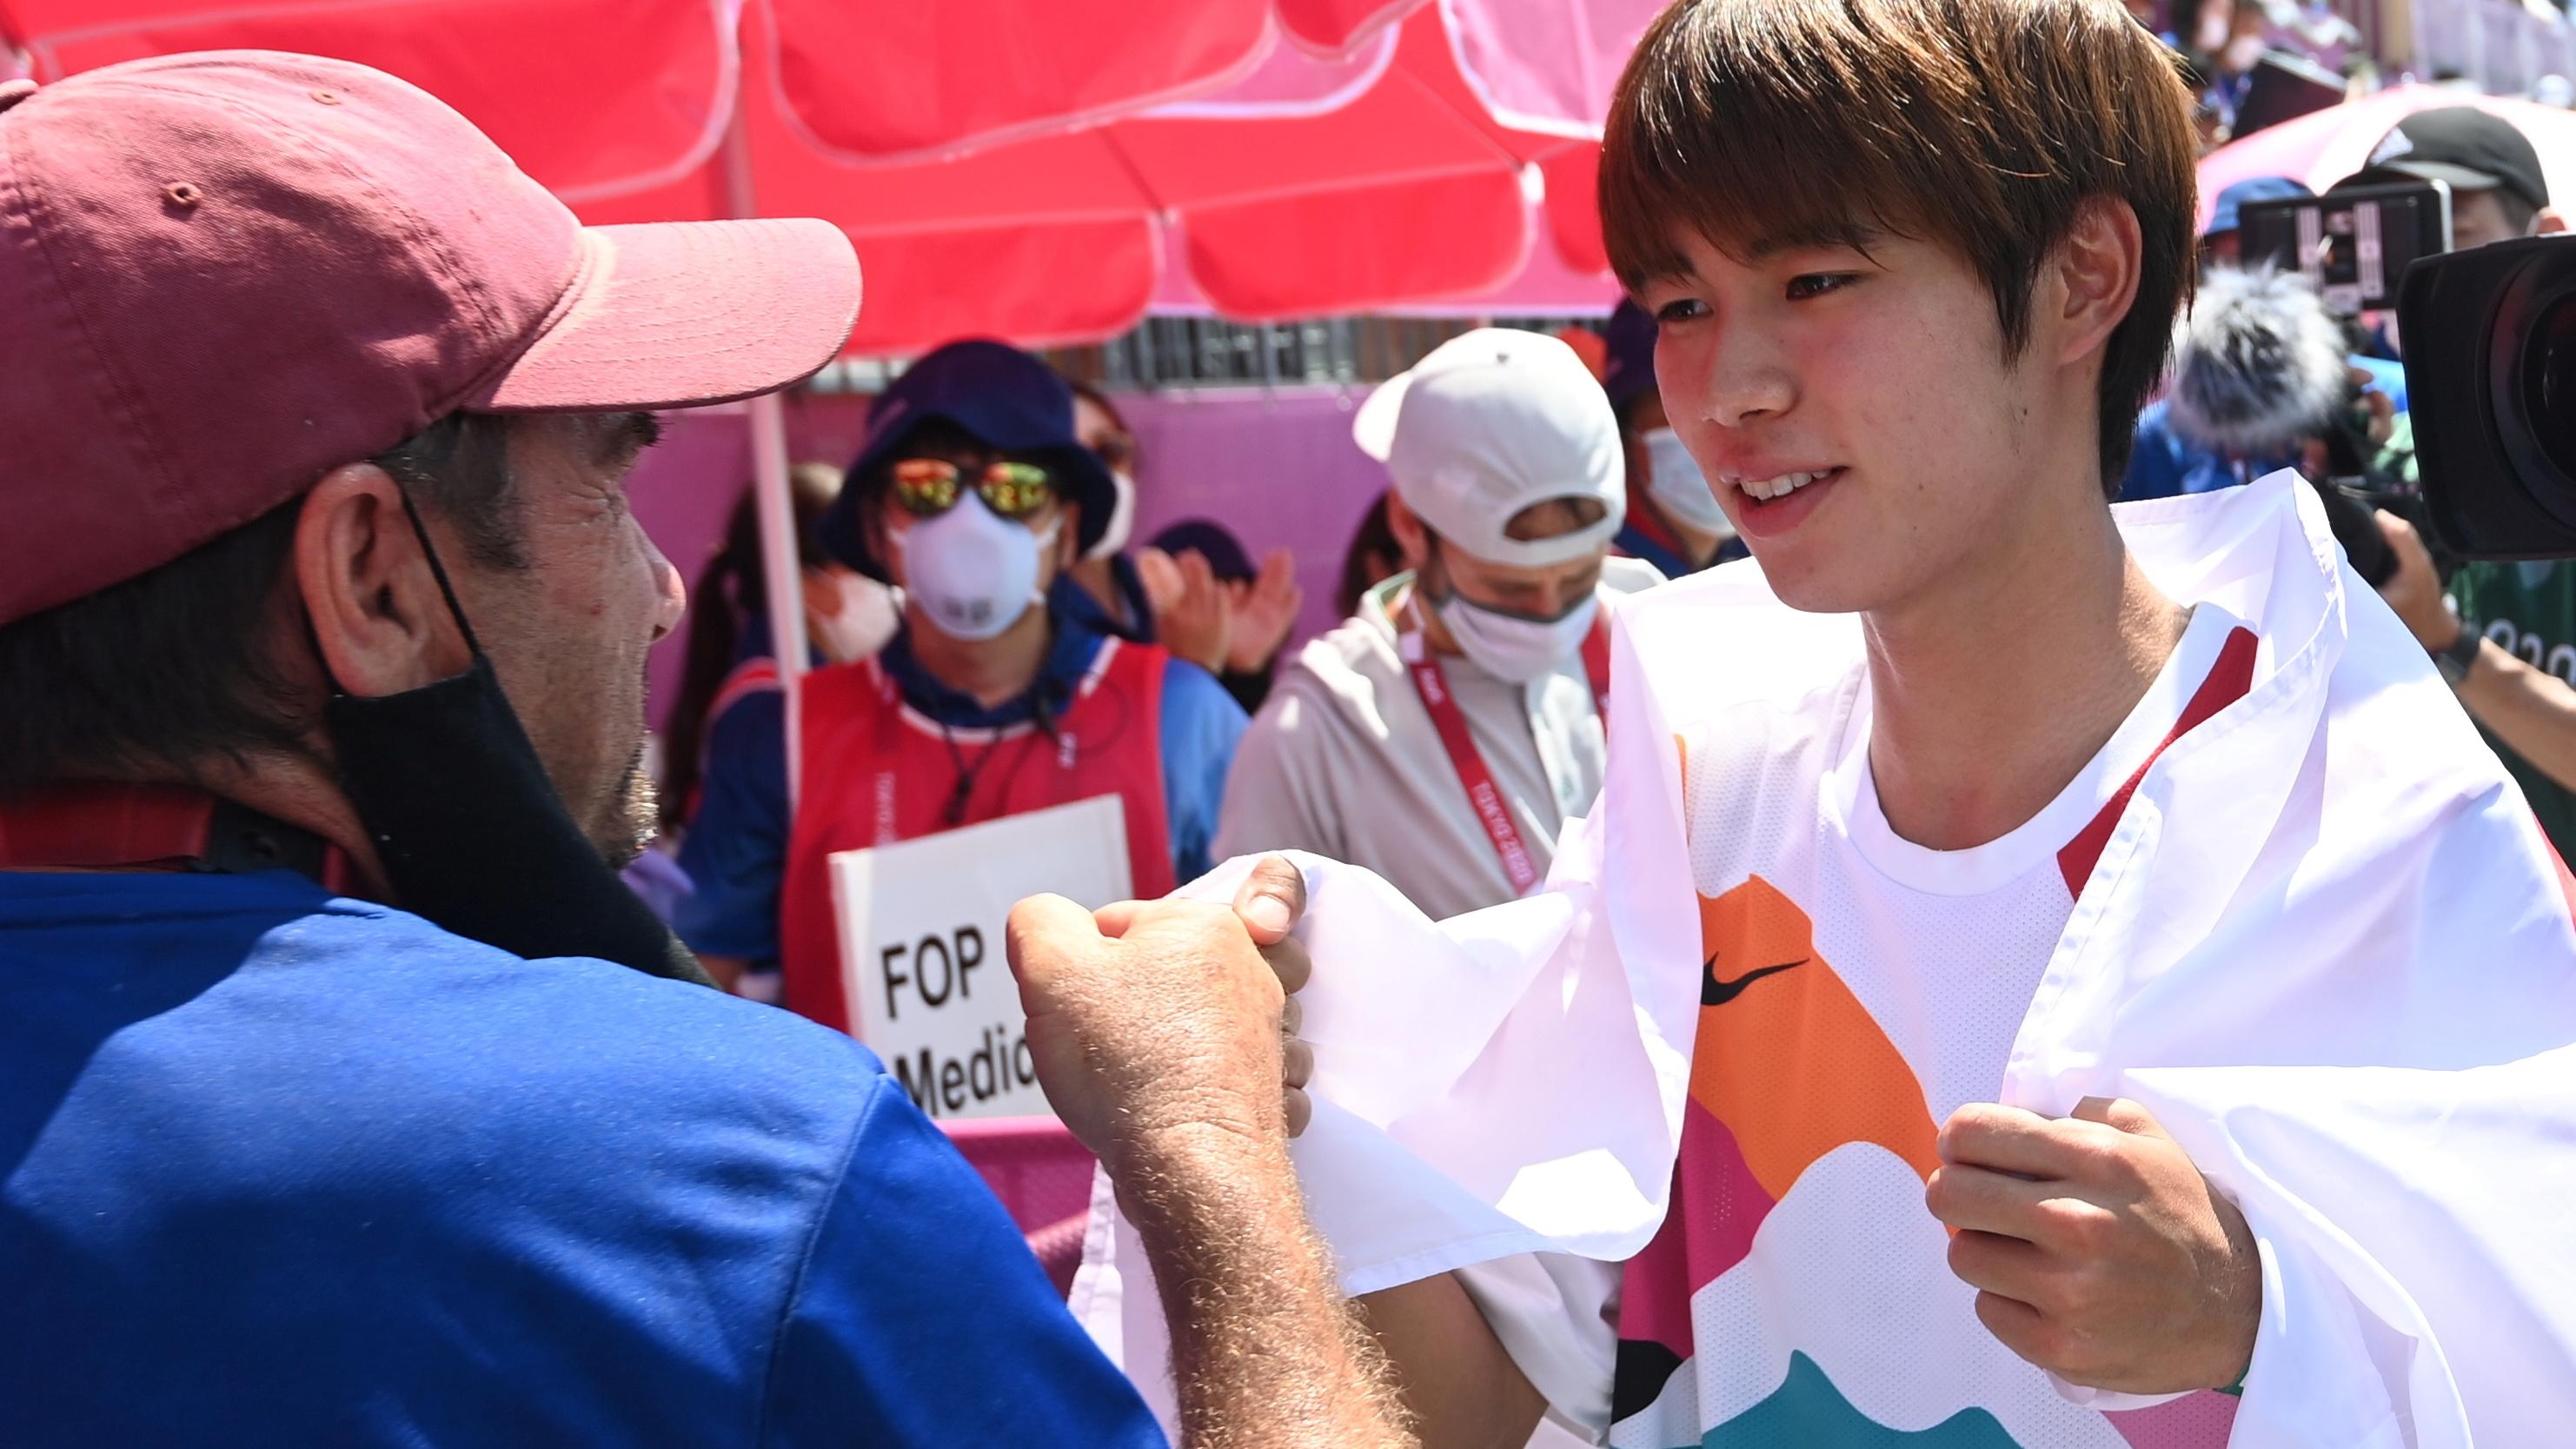 Tokyo 2020 Olympics - Skateboarding - Men's Street - Final - Ariake Urban Sports Park - Tokyo, Japan - July 25, 2021. Yuto Horigome of Japan wears national flag as he celebrates victory. REUTERS/Toby Melville